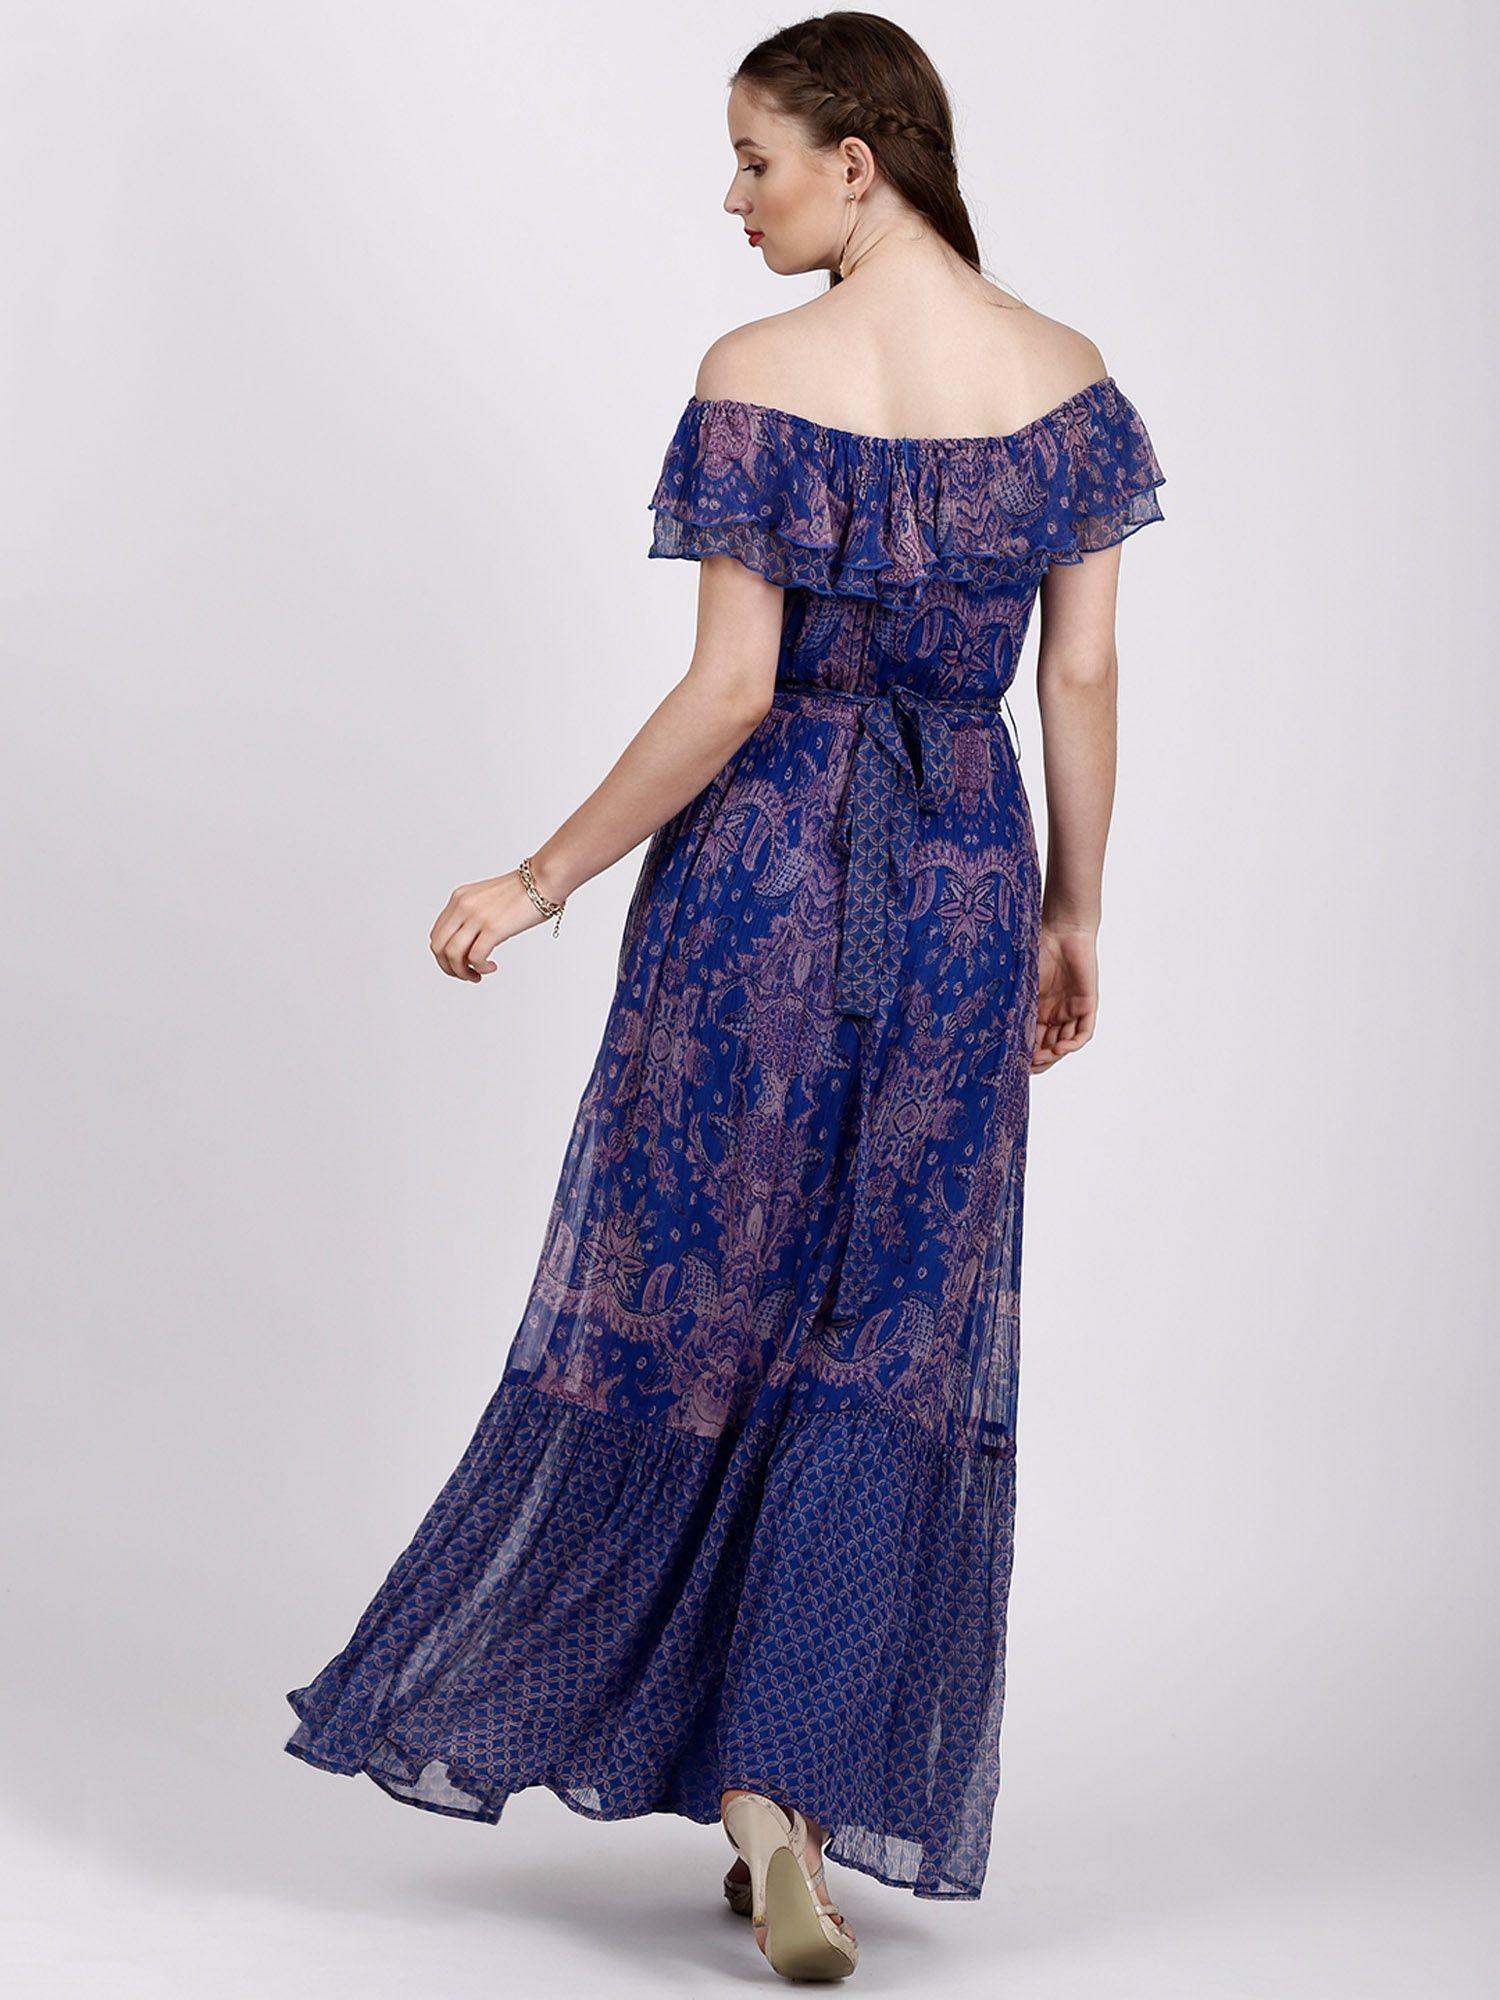 225c039f1283 Label Ritu Kumar Dresses   Buy Label Ritu Kumar Off Shoulder Long ...